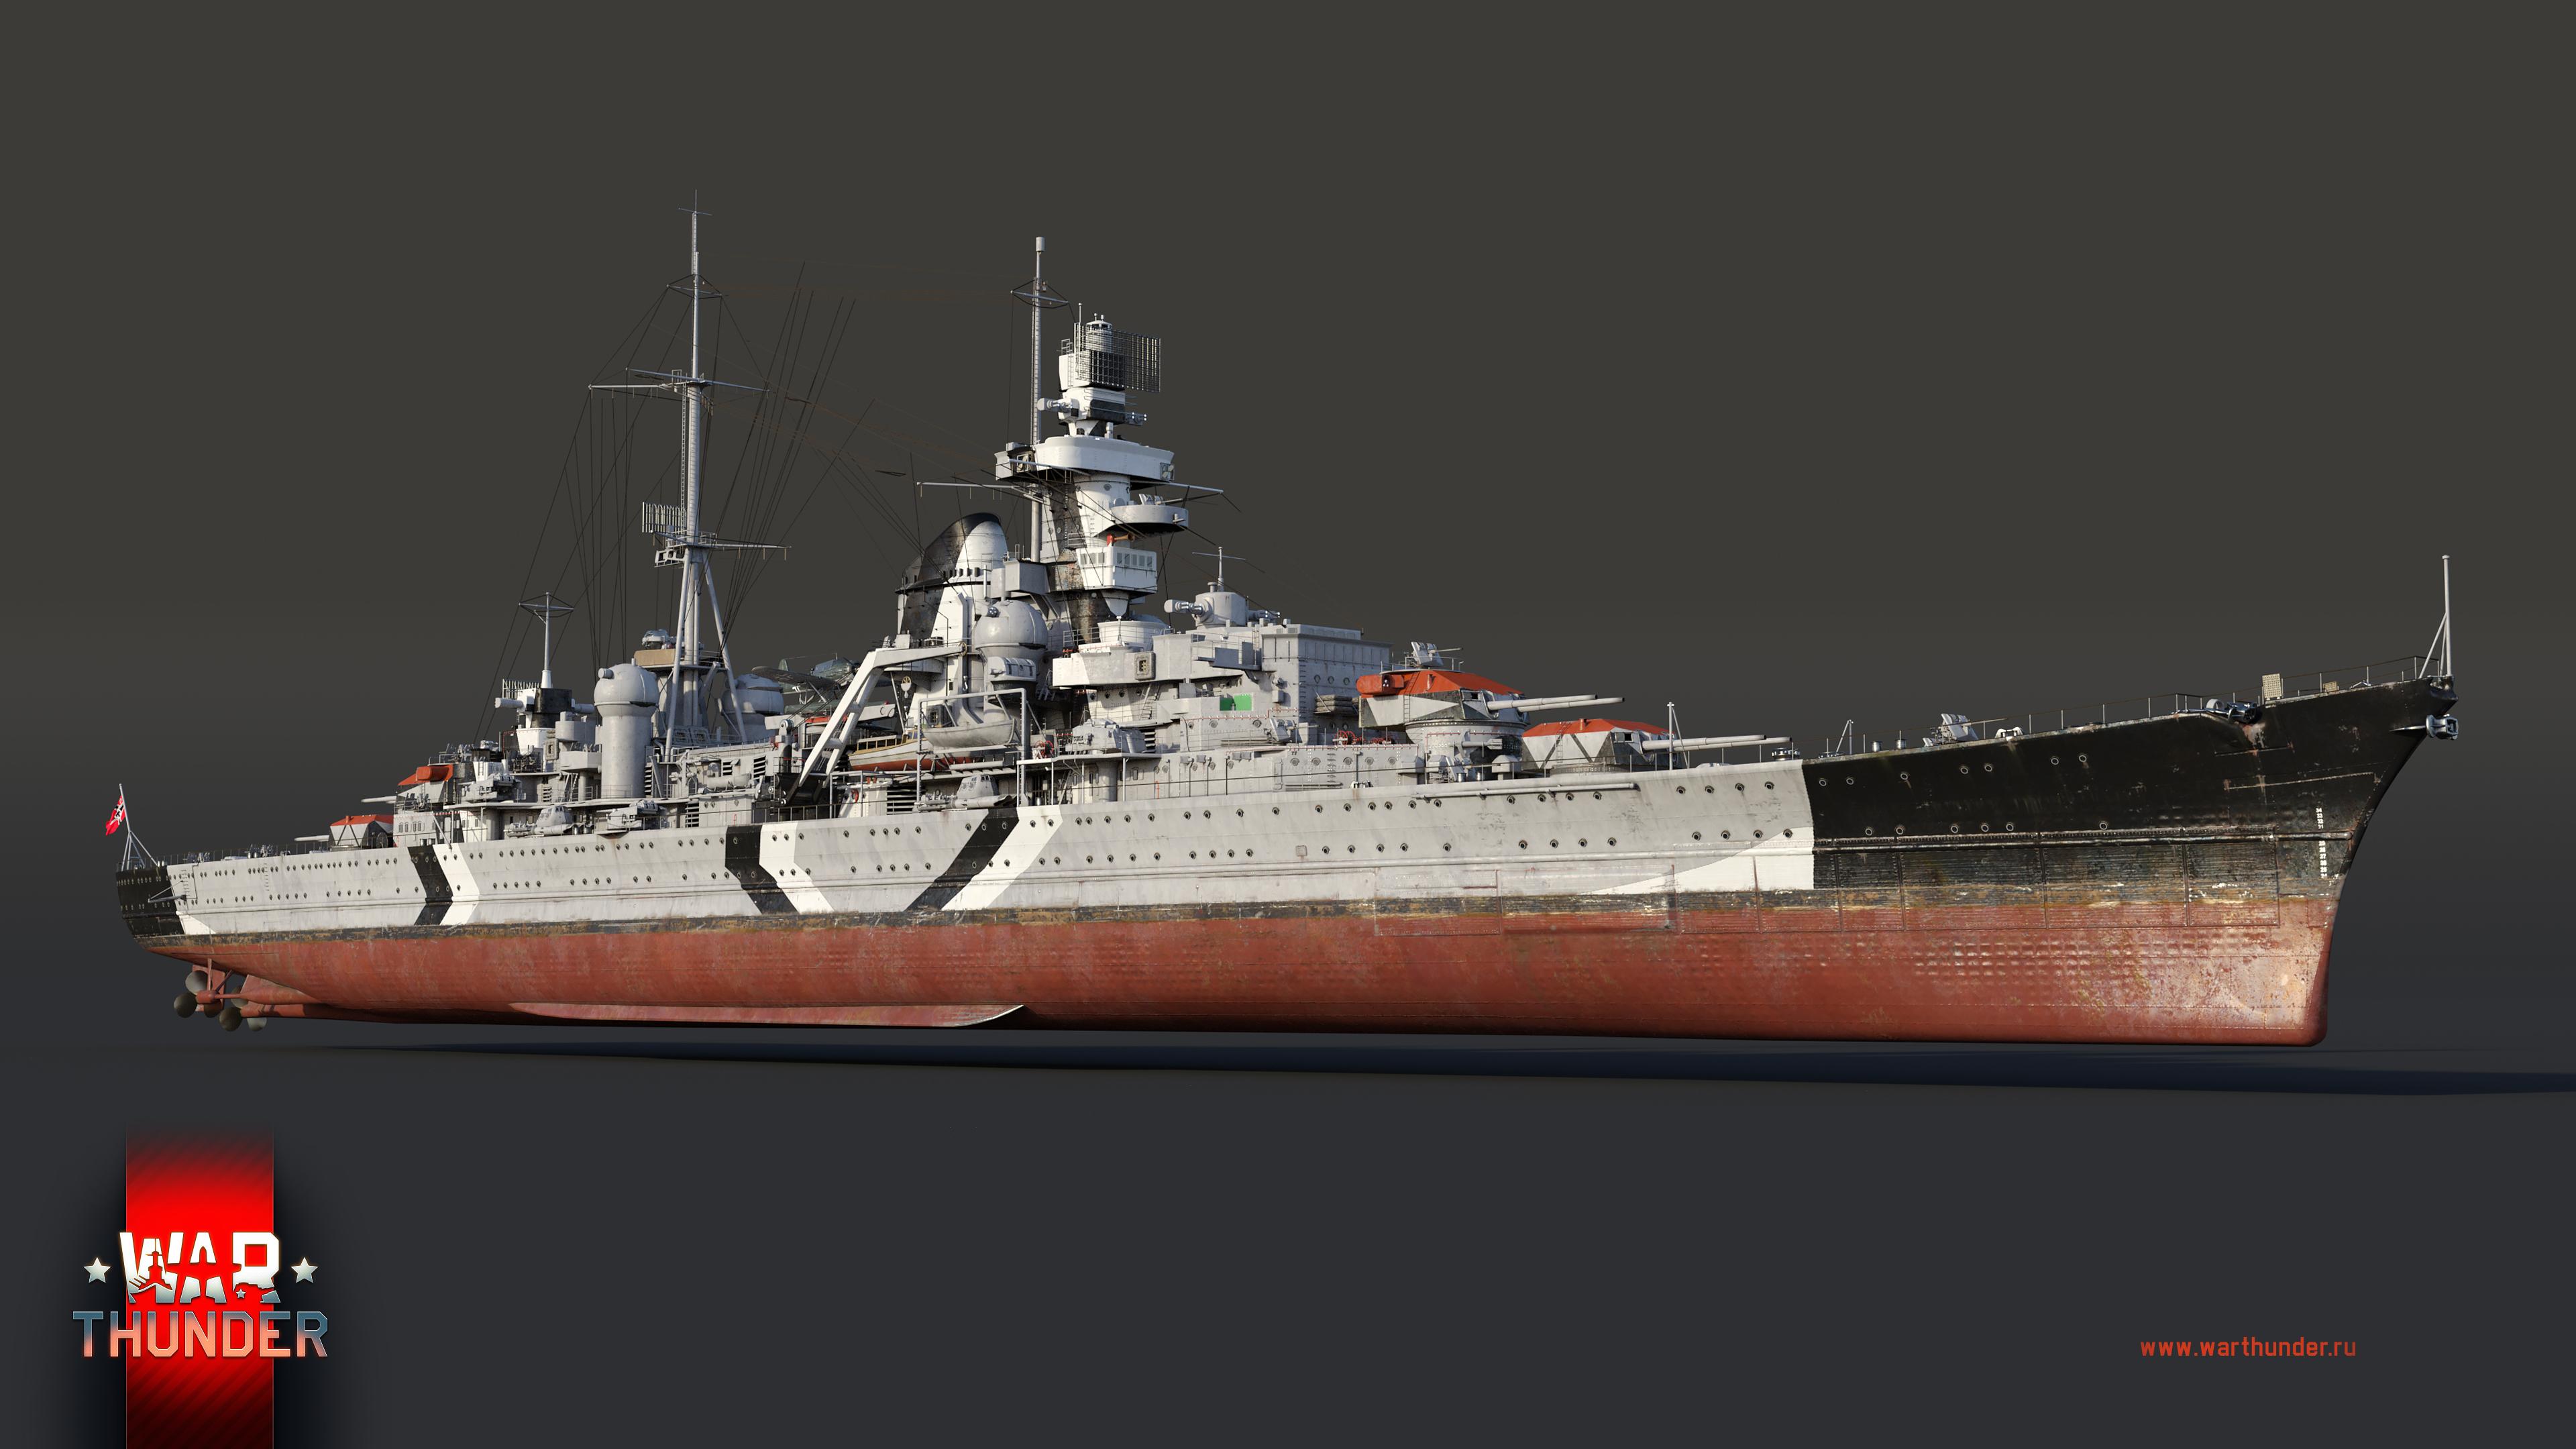 cruiser_prinz_eugen_3840x2160_logo_ru_36